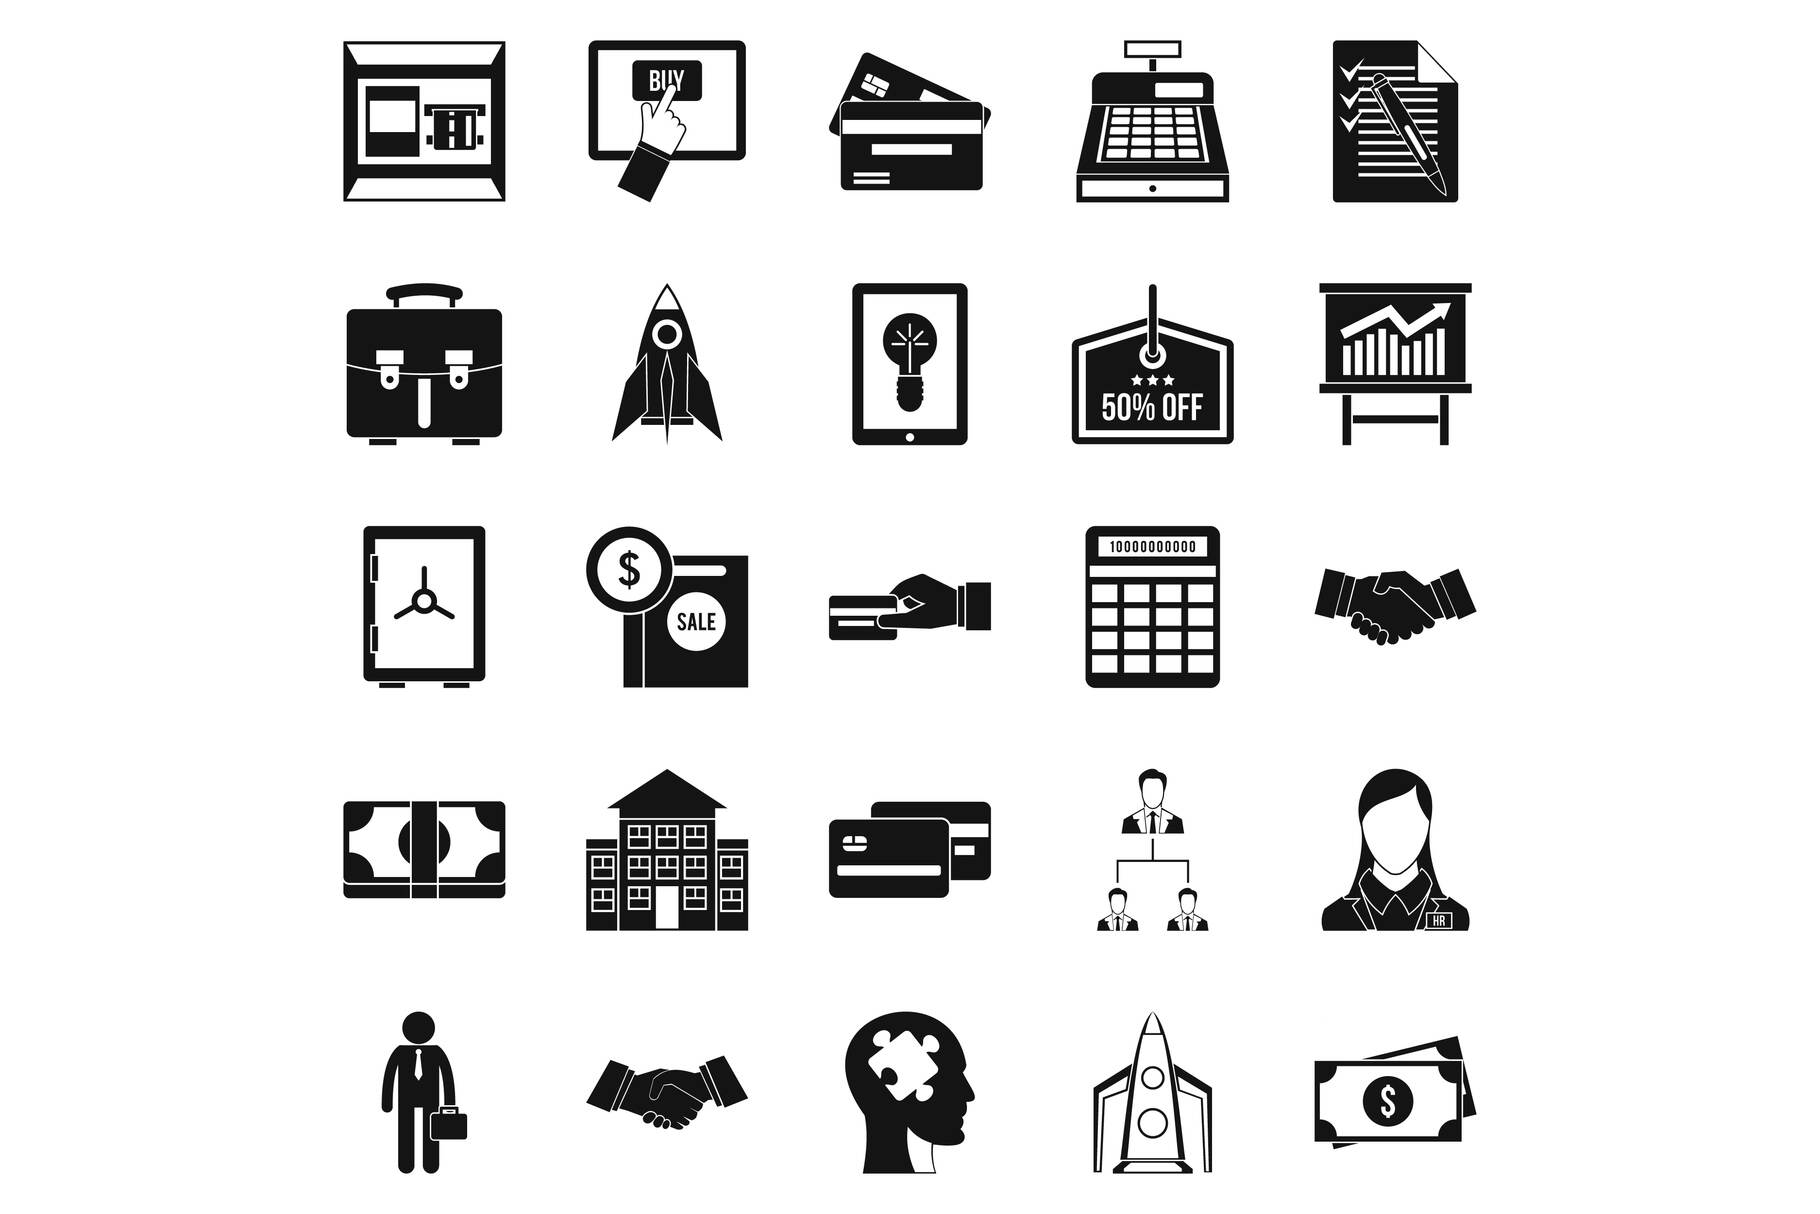 SEO development icons set, simple style example image 1